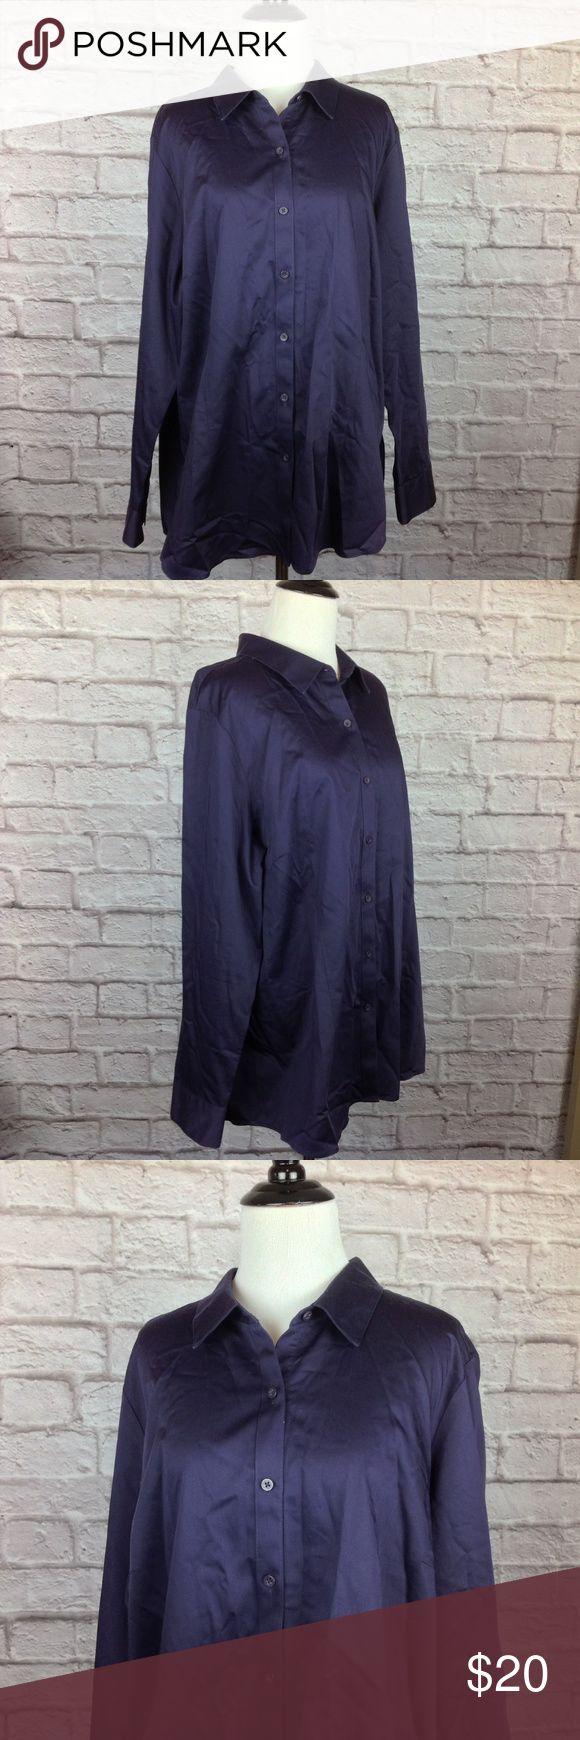 Coldwater Creek Top 2X Button Purple Non Iron Great Condition;  Coldwater Creek Top Women 2X Button Purple Non Iron Shirt Cotton; 28 inch length; 24 inch across bust Coldwater Creek Tops Button Down Shirts